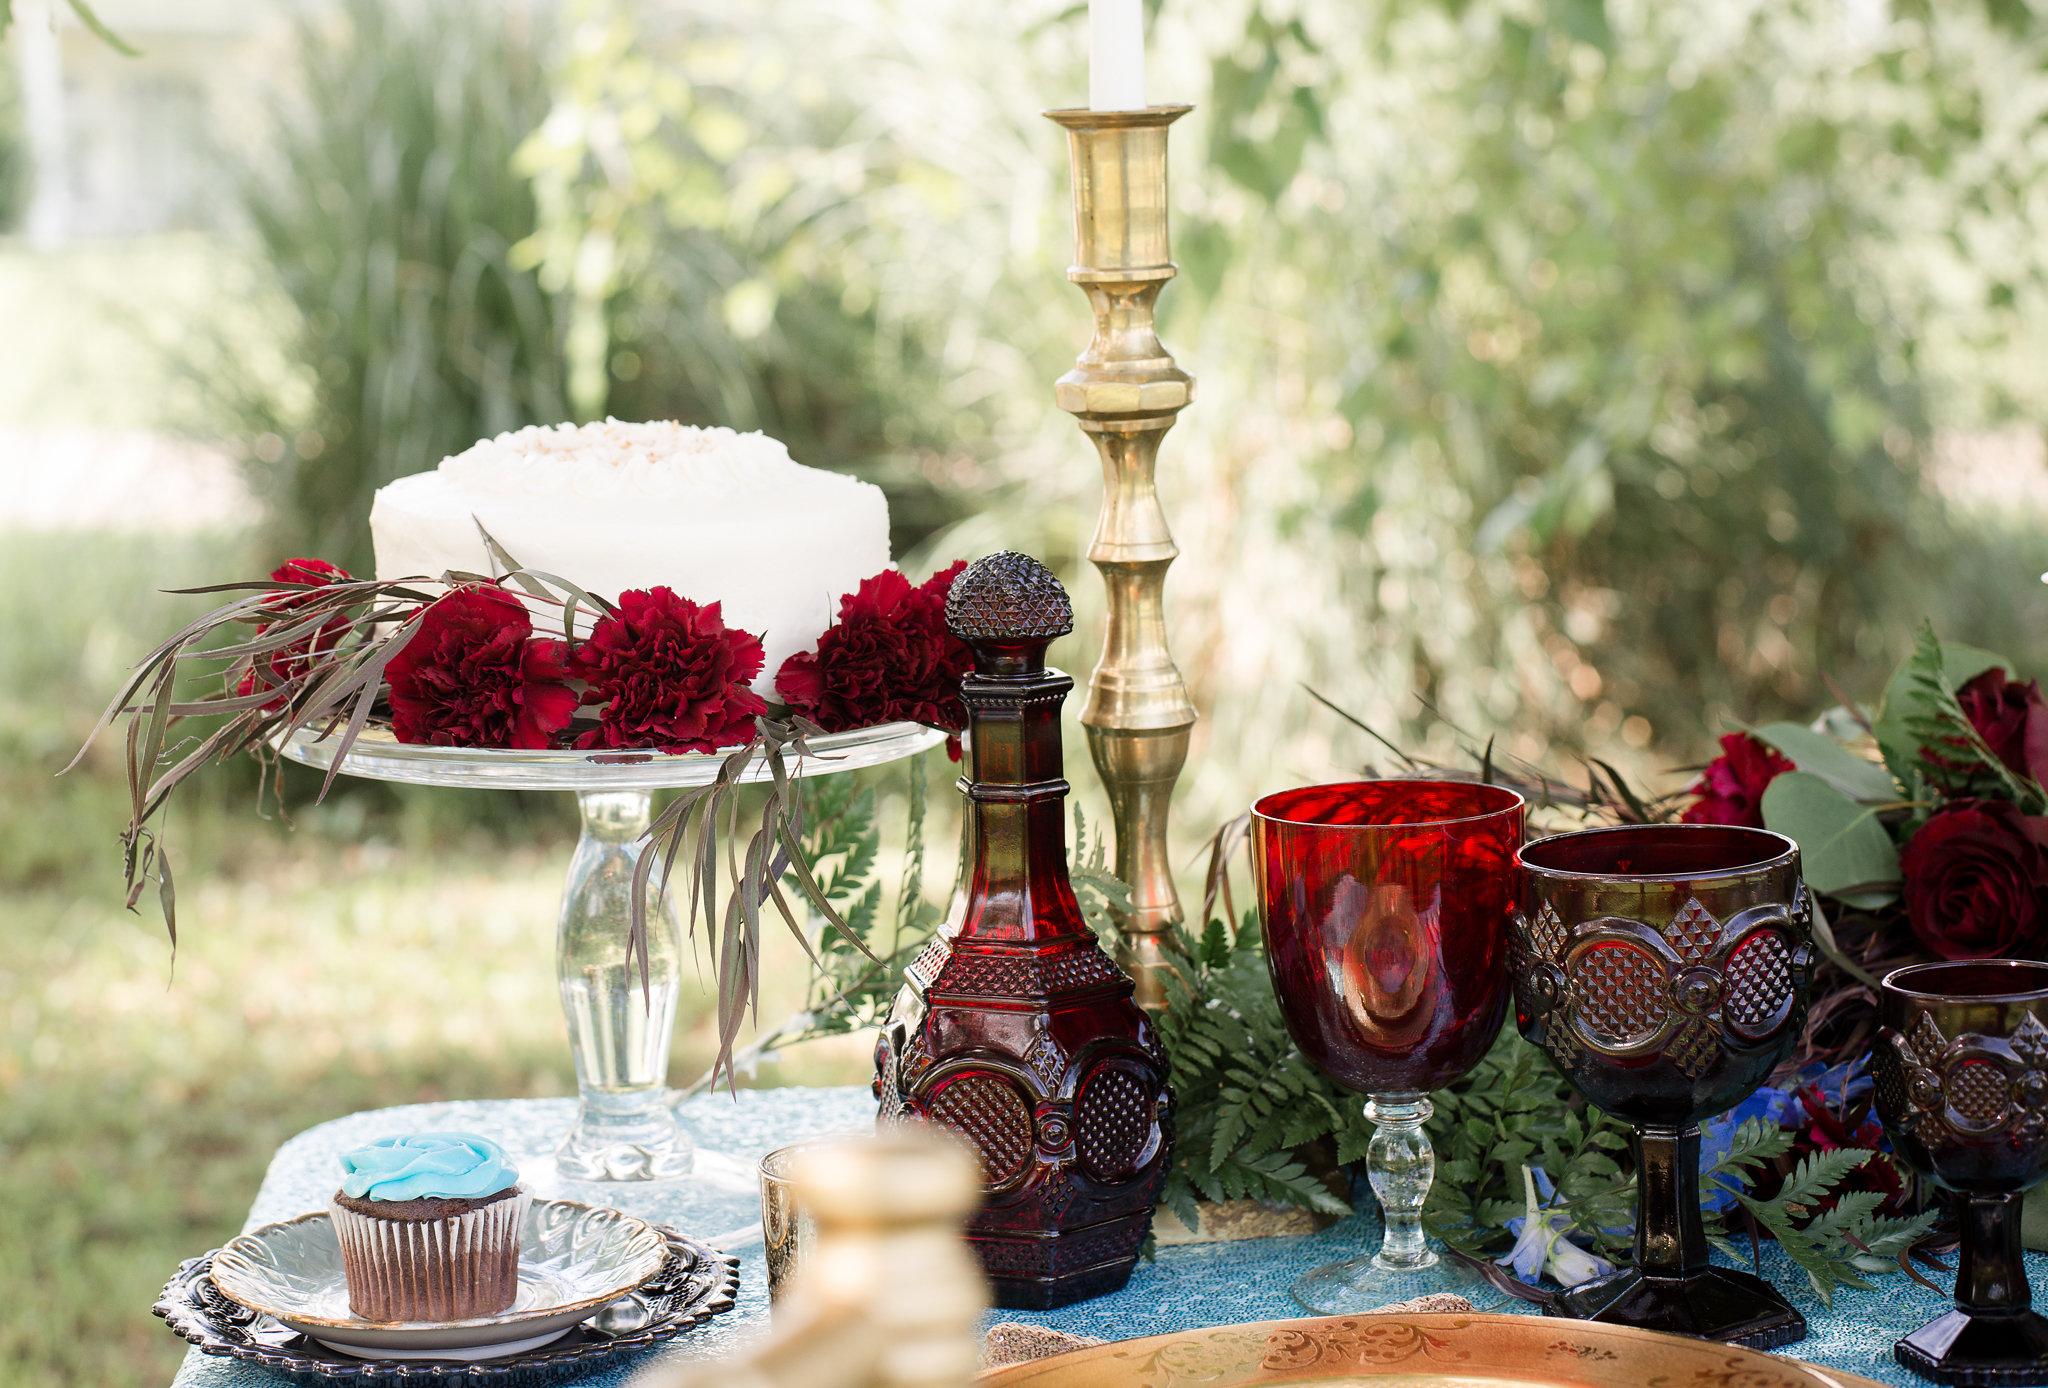 elizabeth-hayden-photography-wedding-arkansas-6167.jpg